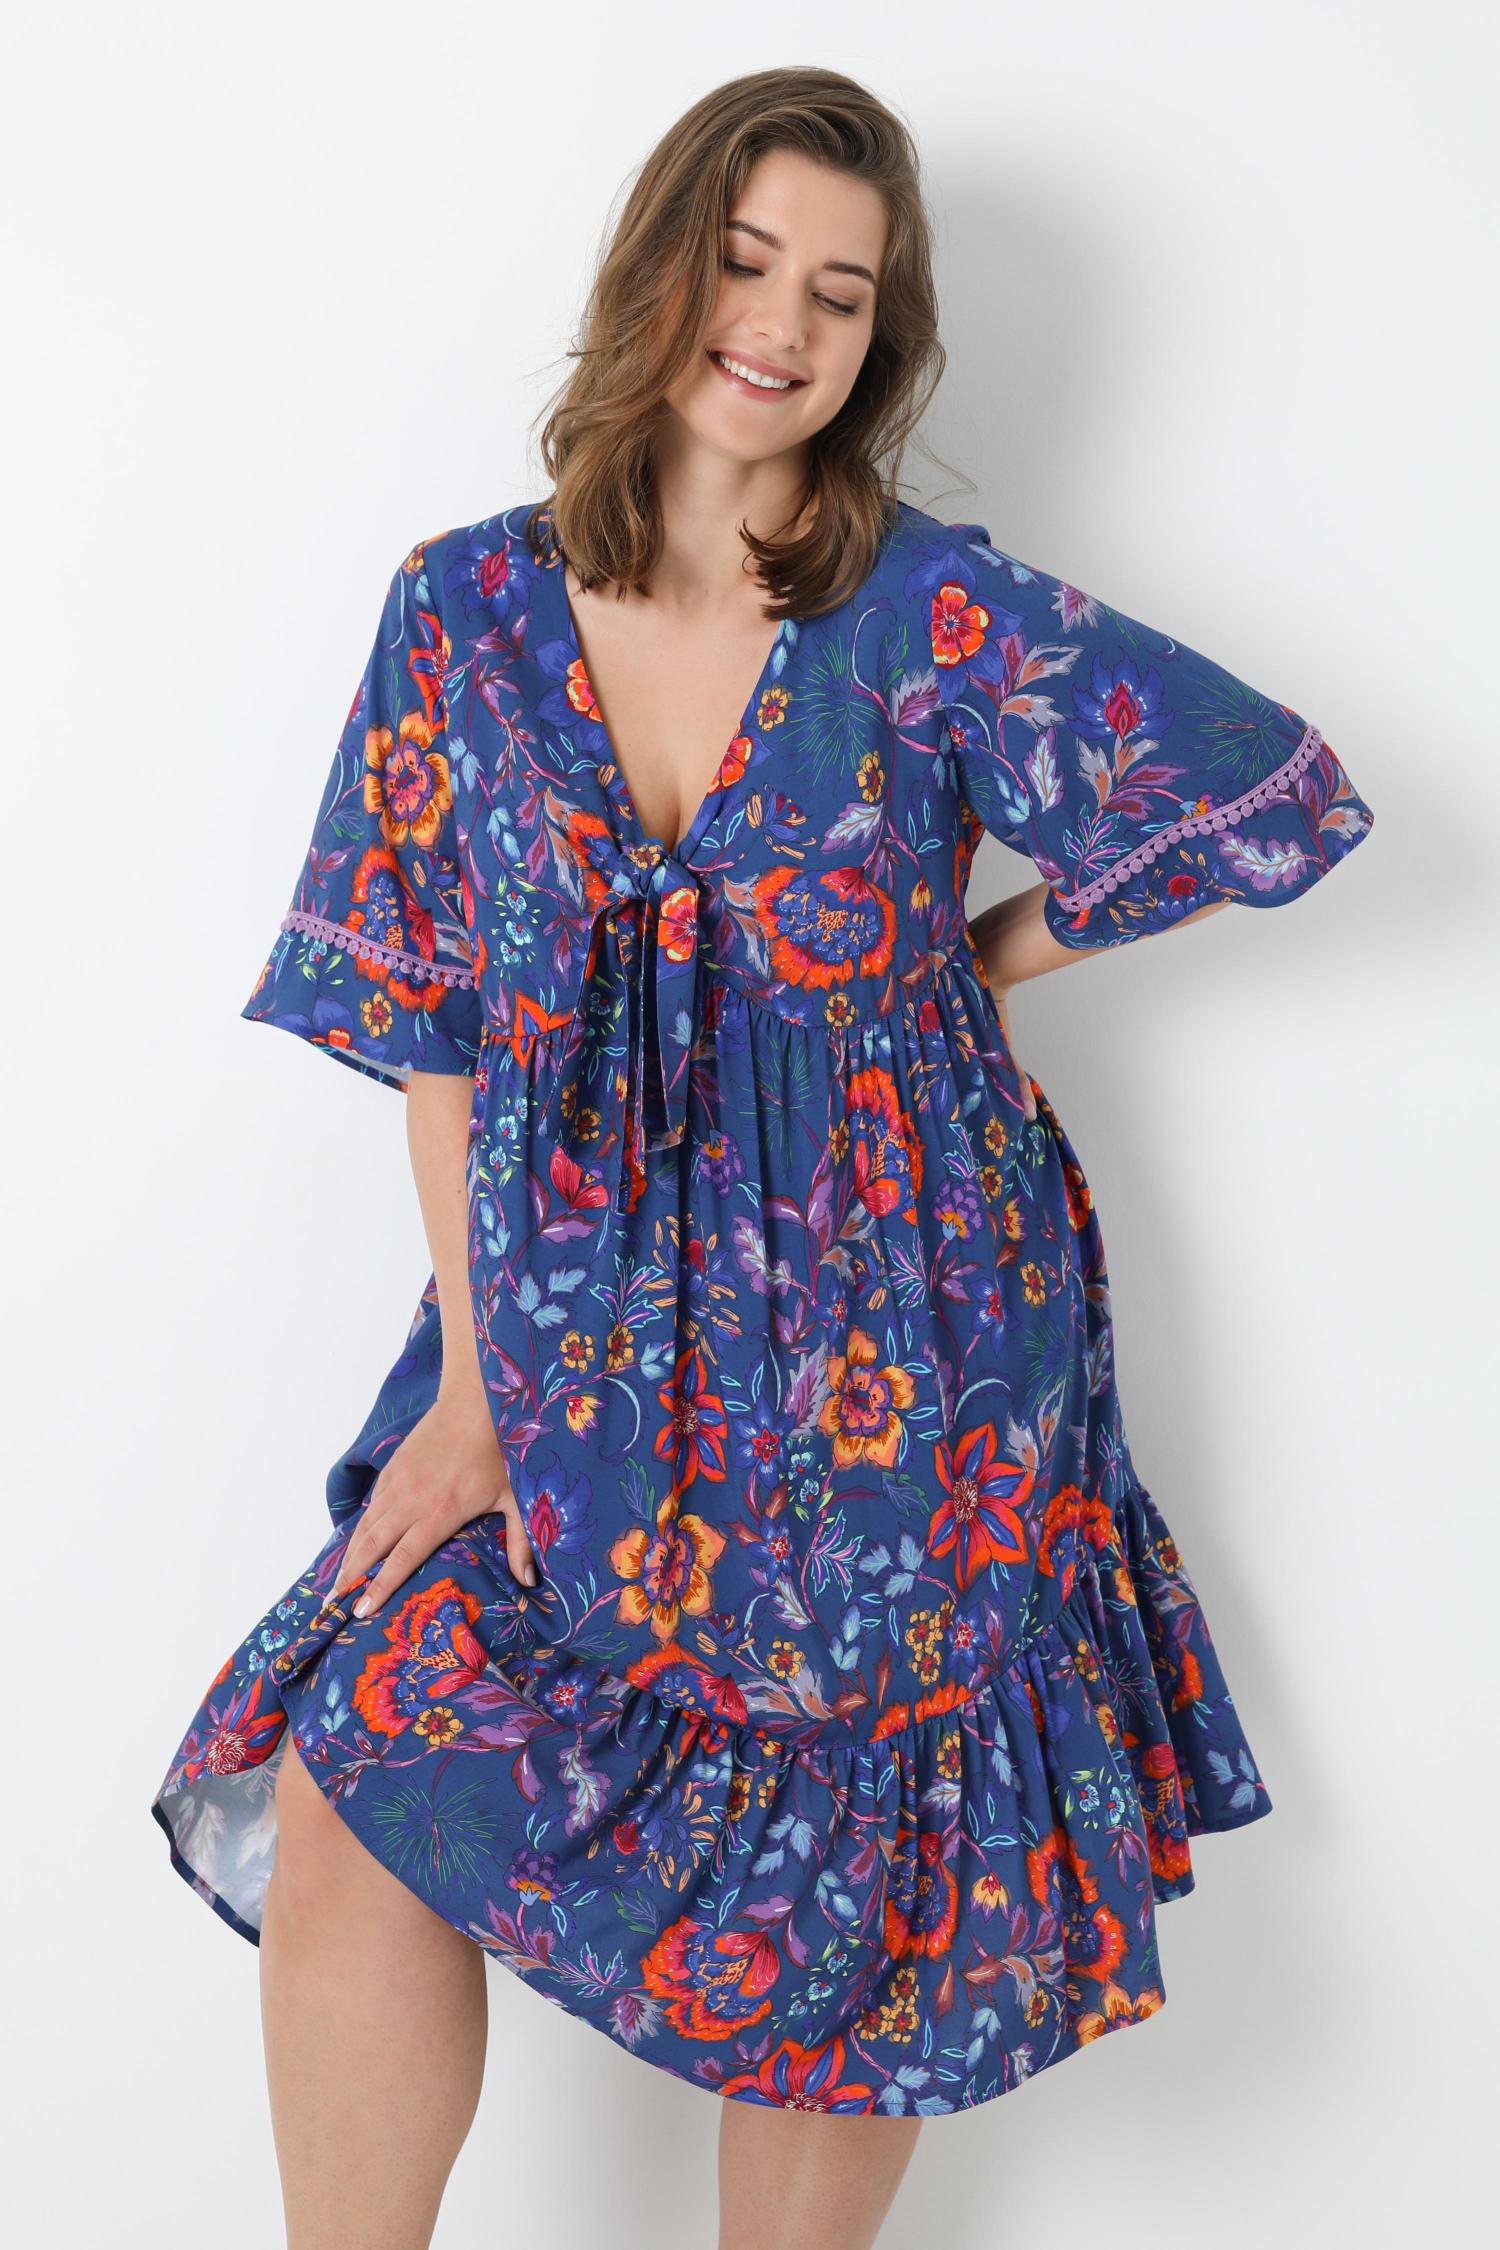 Mid-length dress printed with oeko-tex fabrics